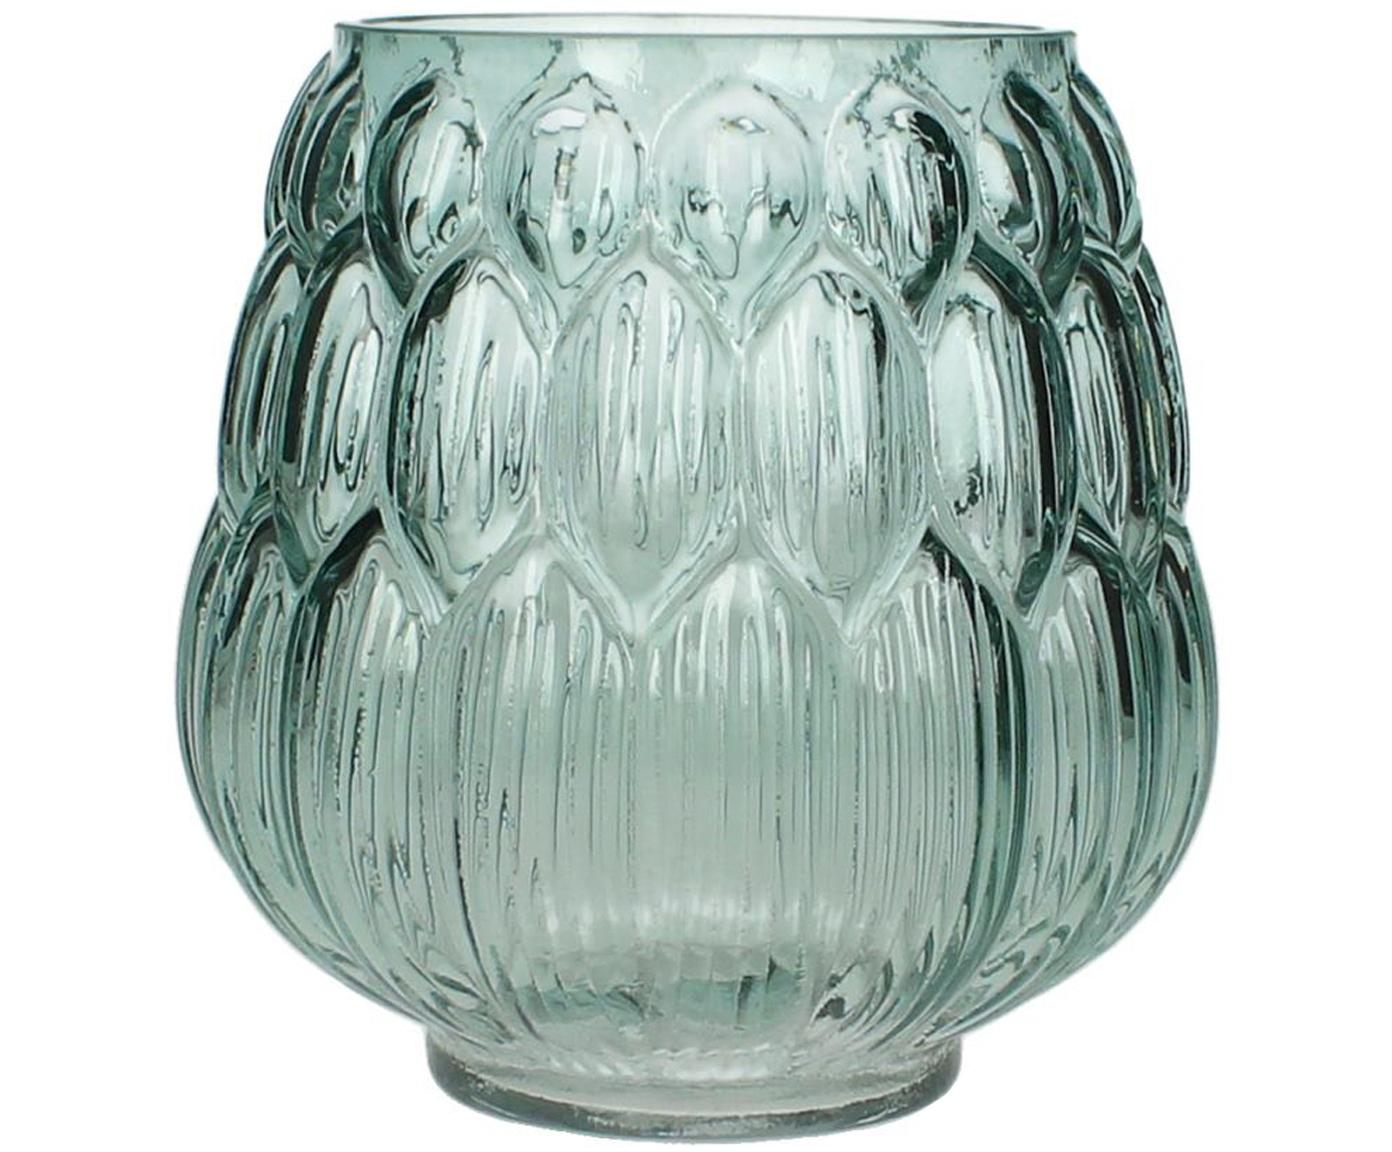 Jarrón de vidrio Berry, Vidrio, Azul petróleo, Ø 14 x Al 15 cm